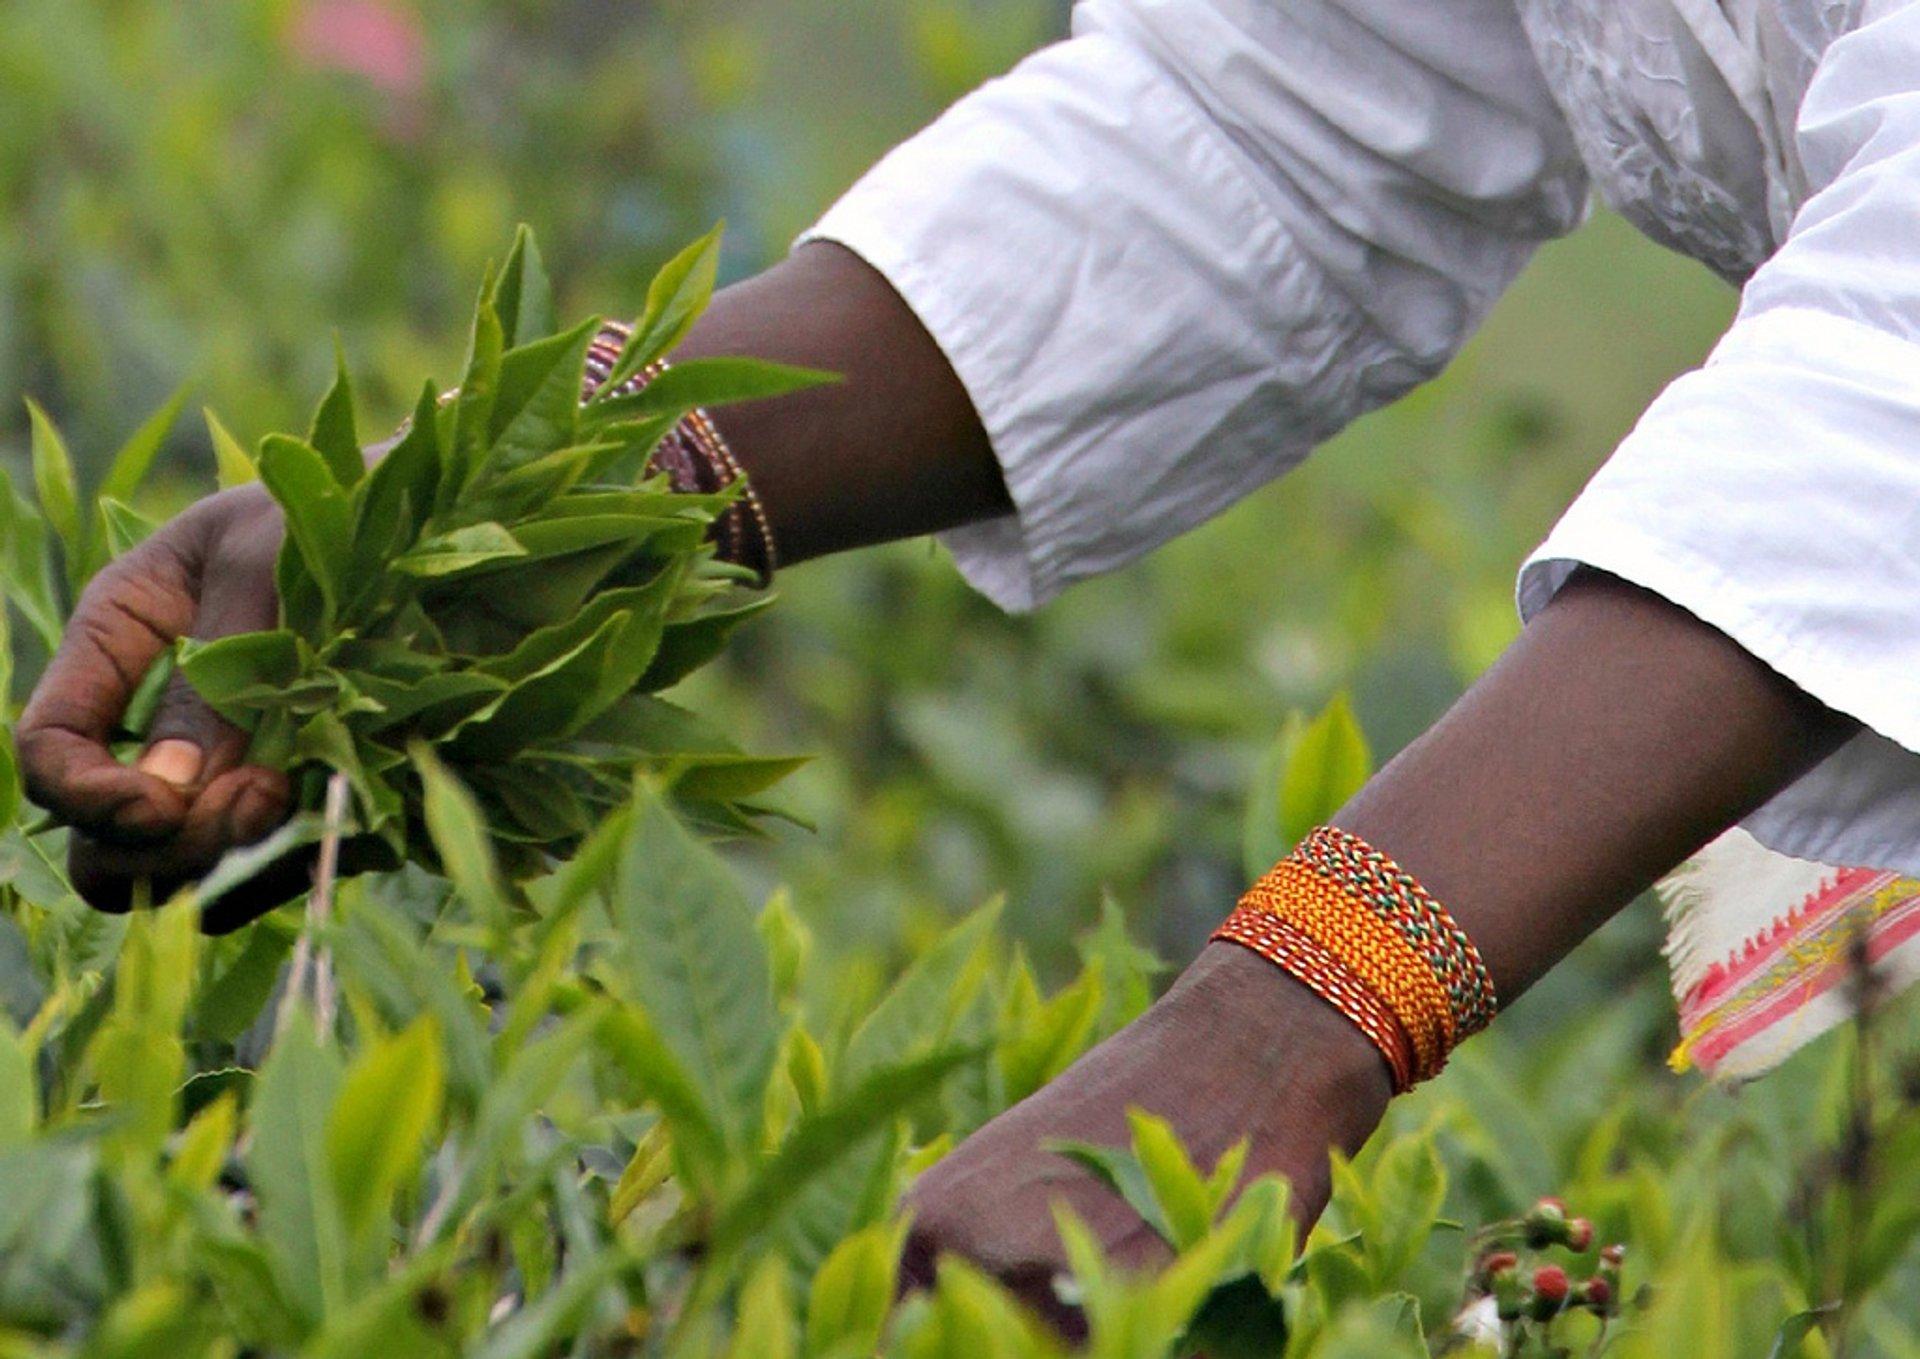 Uva Tea Harvest in Sri Lanka 2019 - Best Time